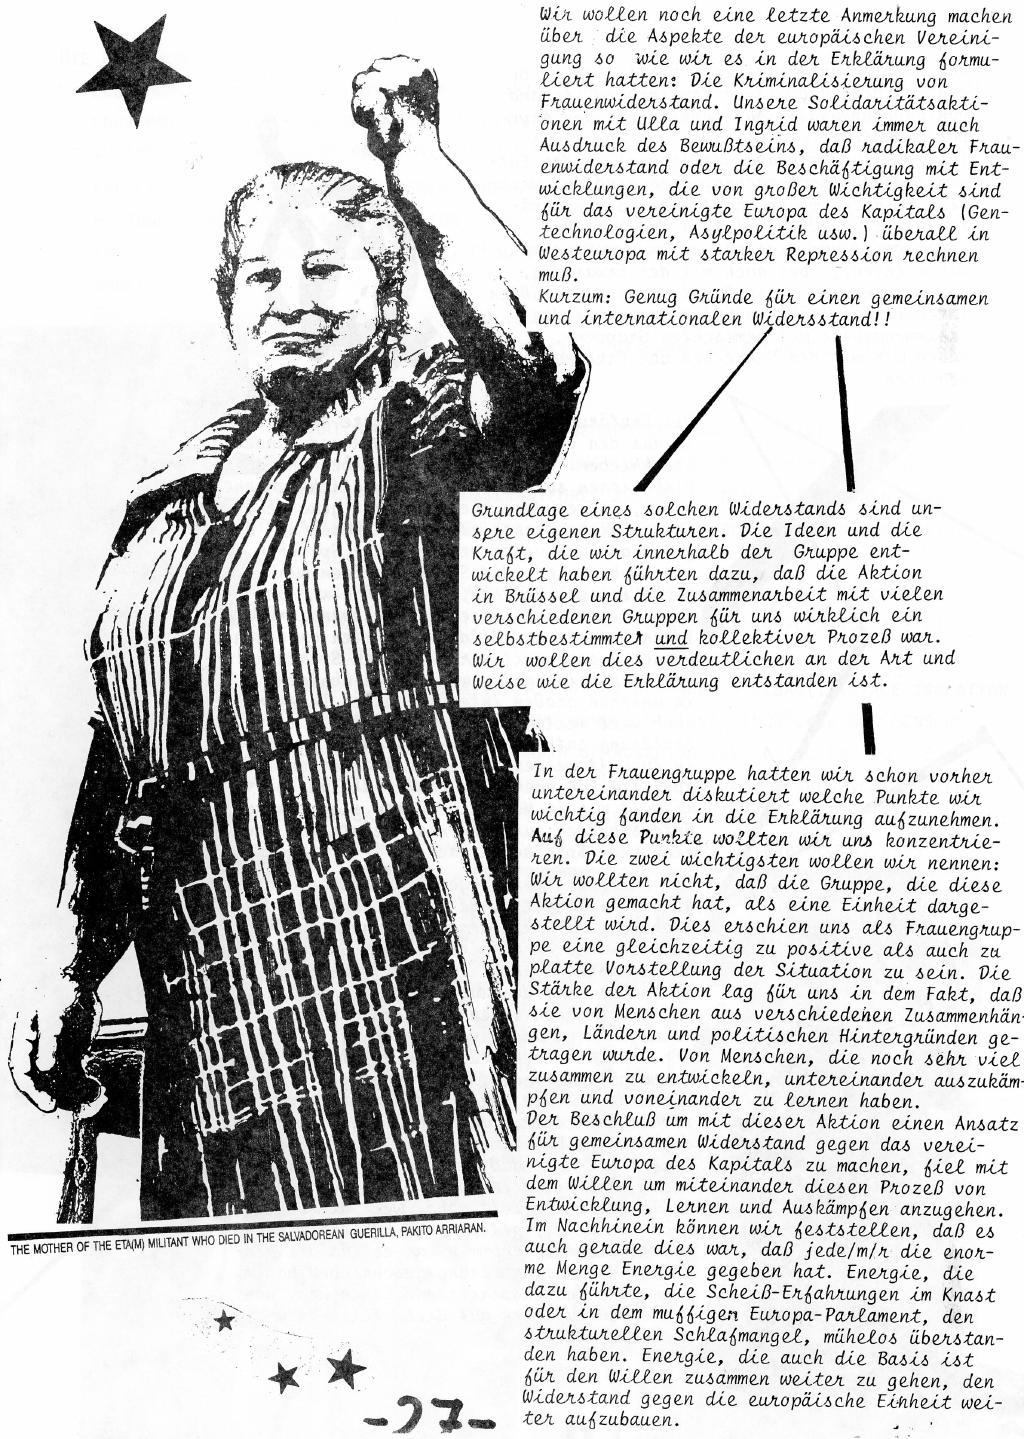 Belgien_Doku_Besetzung_EG_Kommission_1989_029